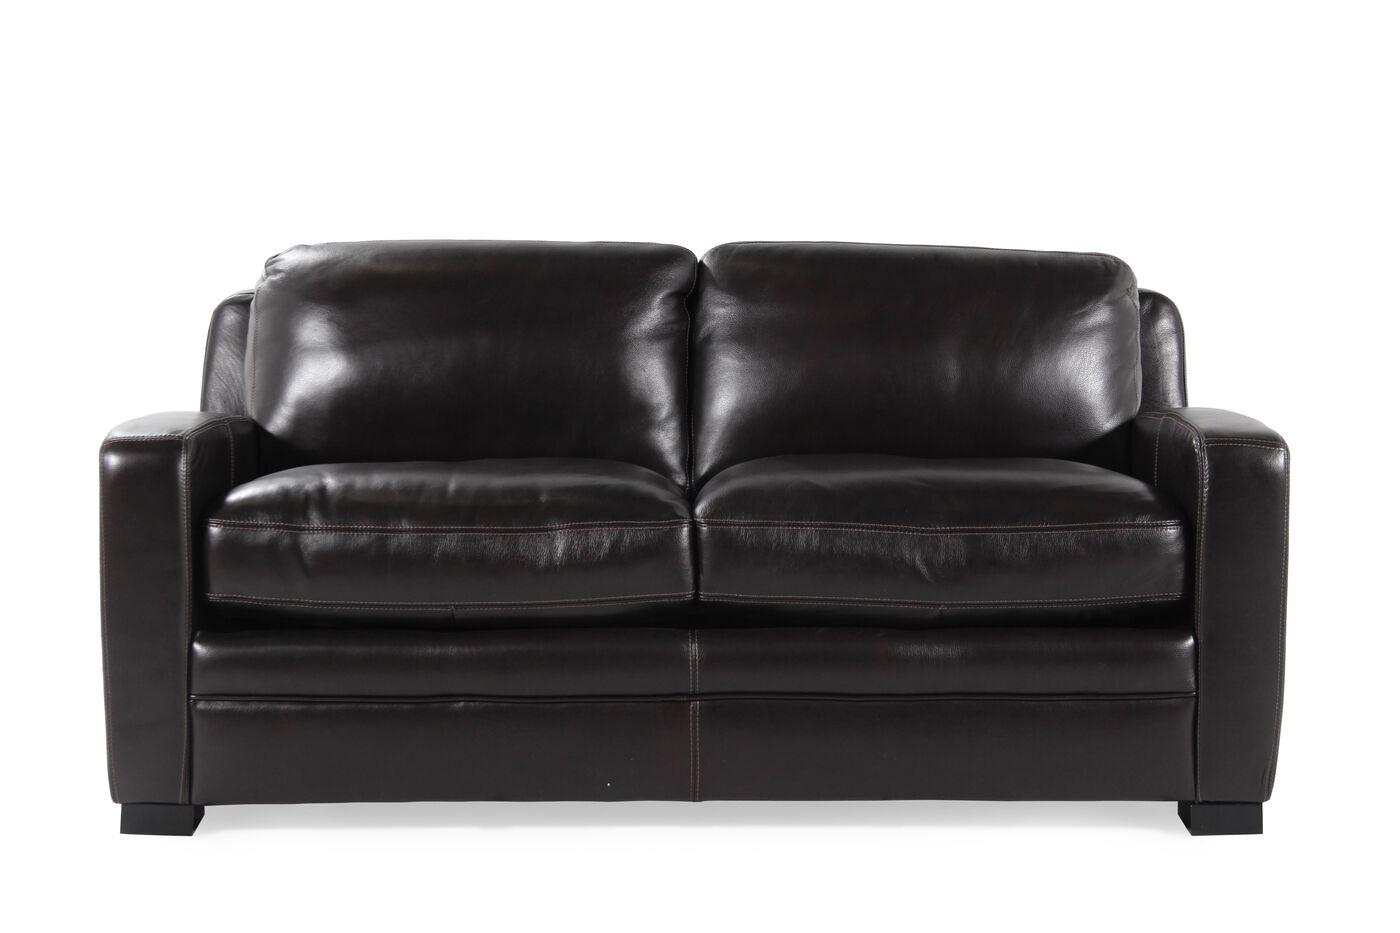 Full Sleeper Sofas Ermerson Apartment Size Sleeper Sofa